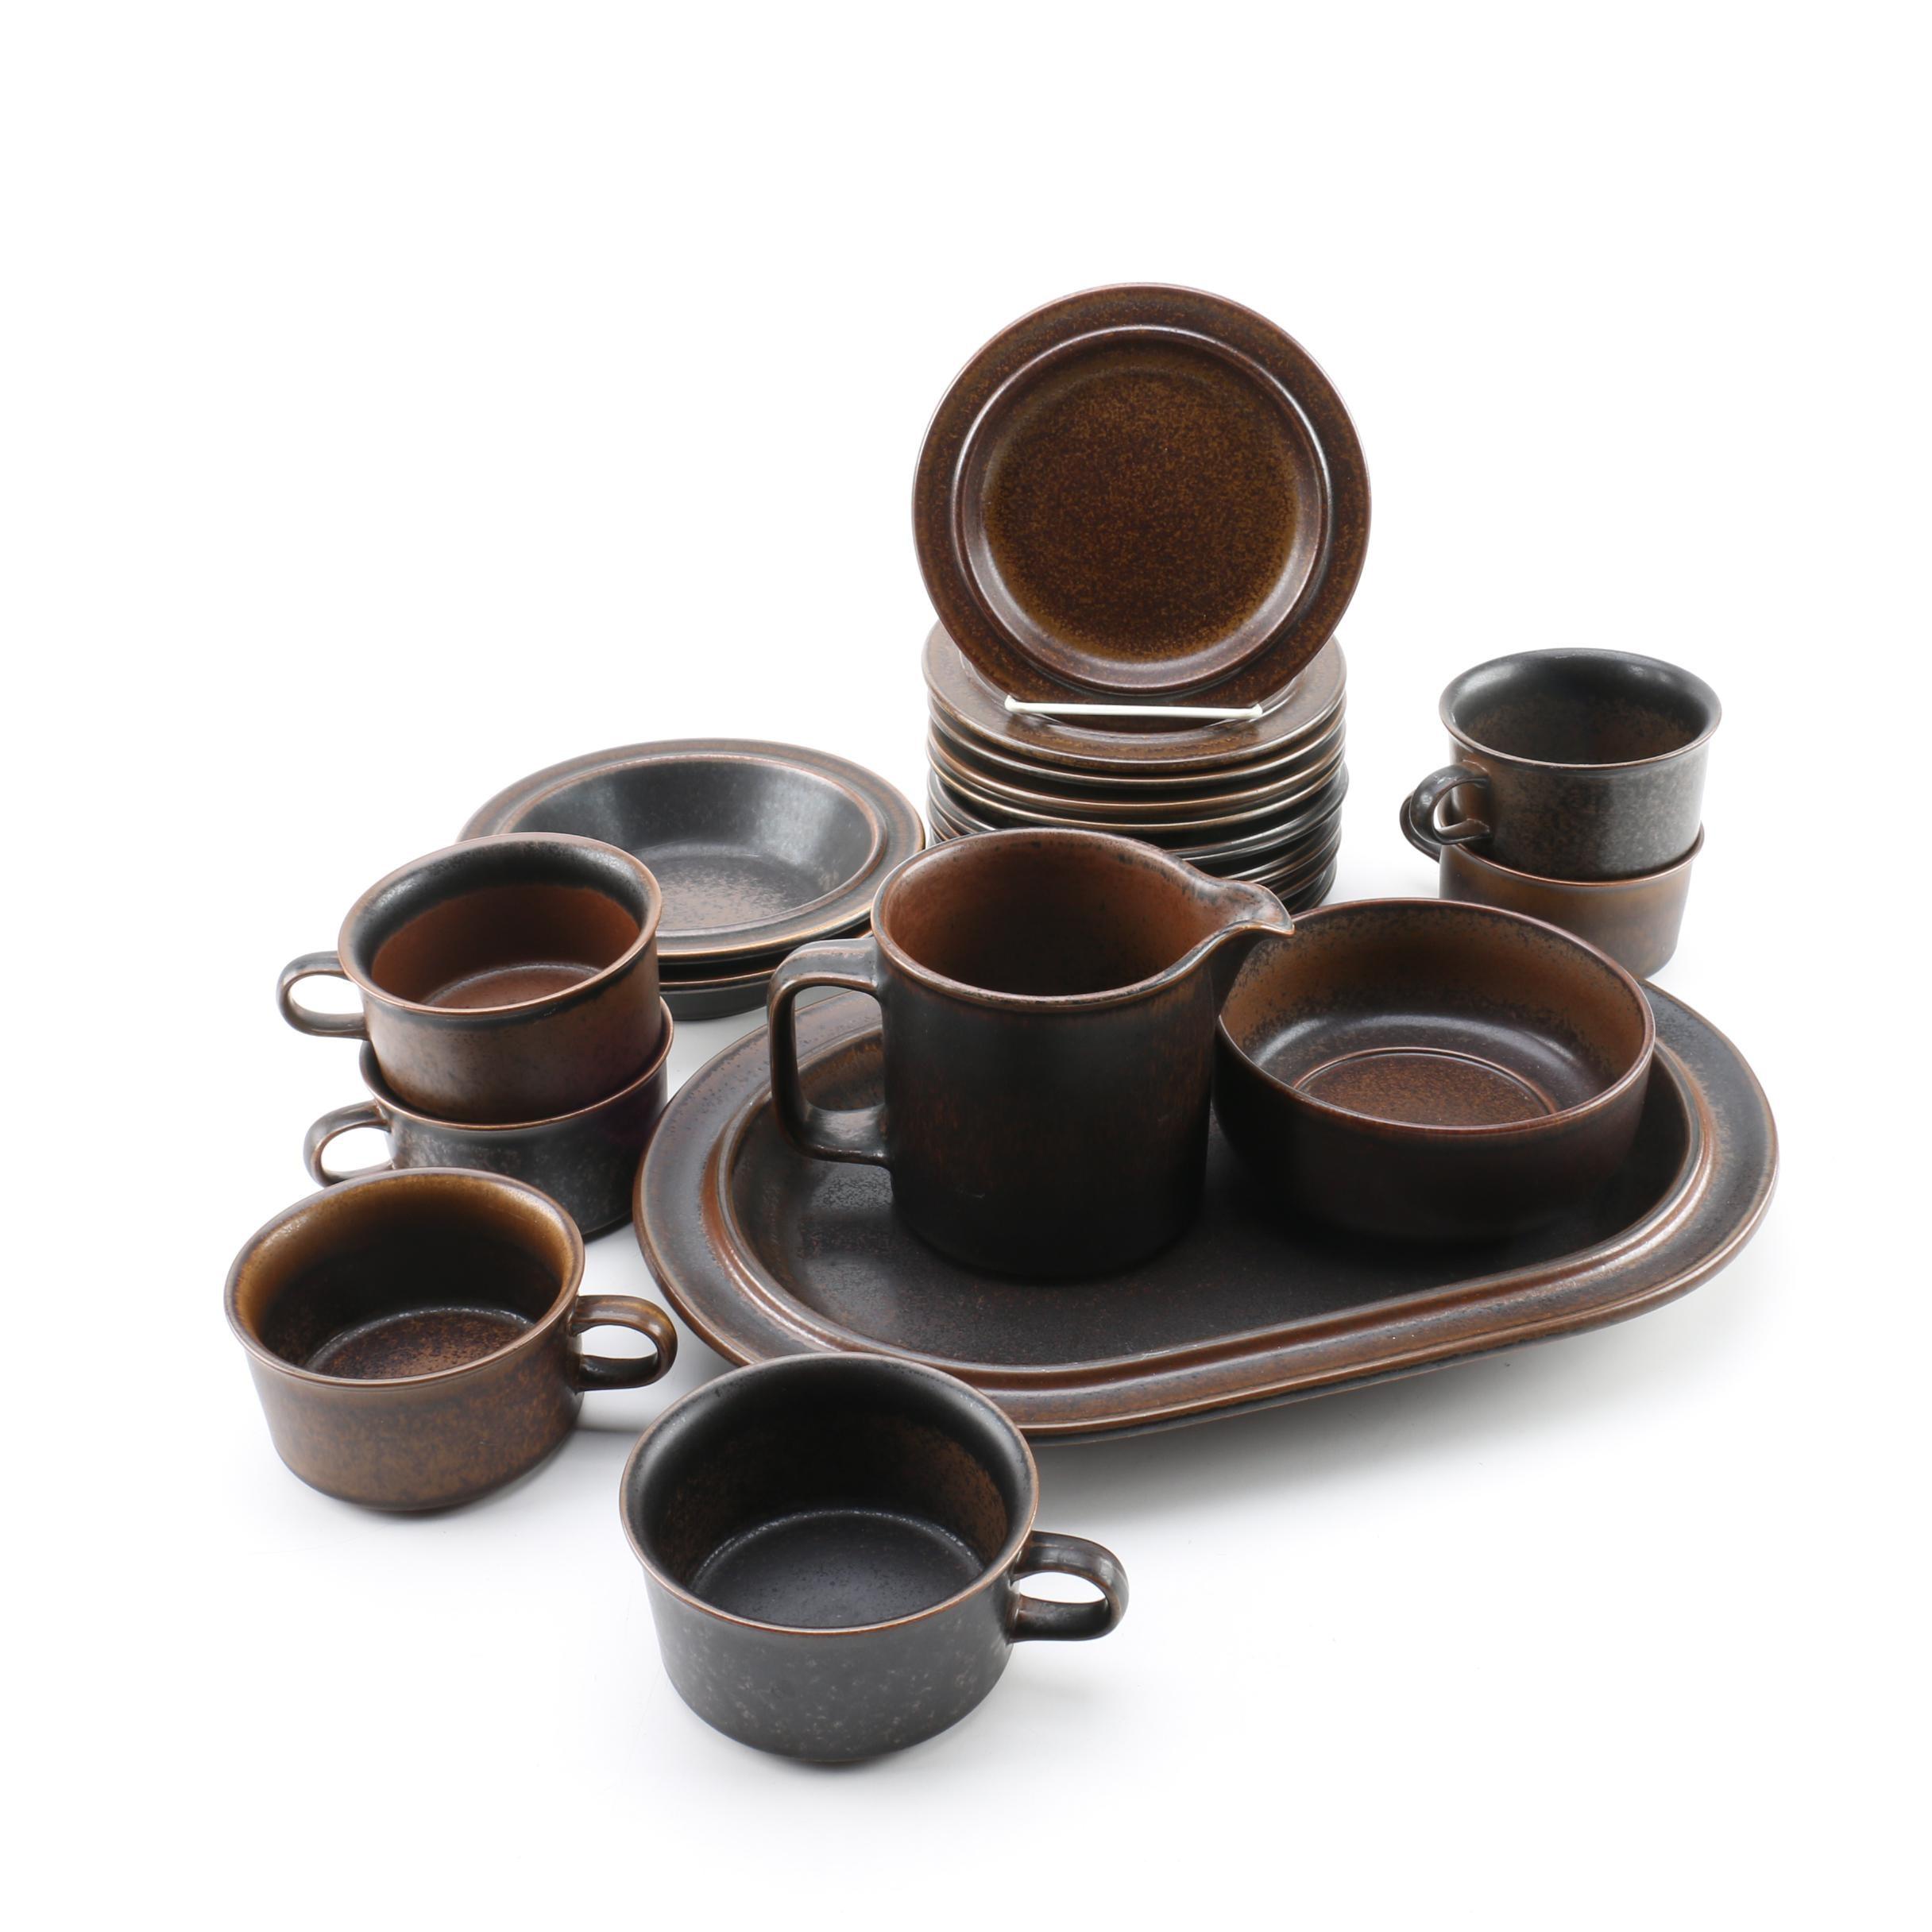 Arabia  Ruska  Variegated Brown Glazed Stoneware Serving Dishes and Tableware ...  sc 1 st  EBTH.com & Arabia